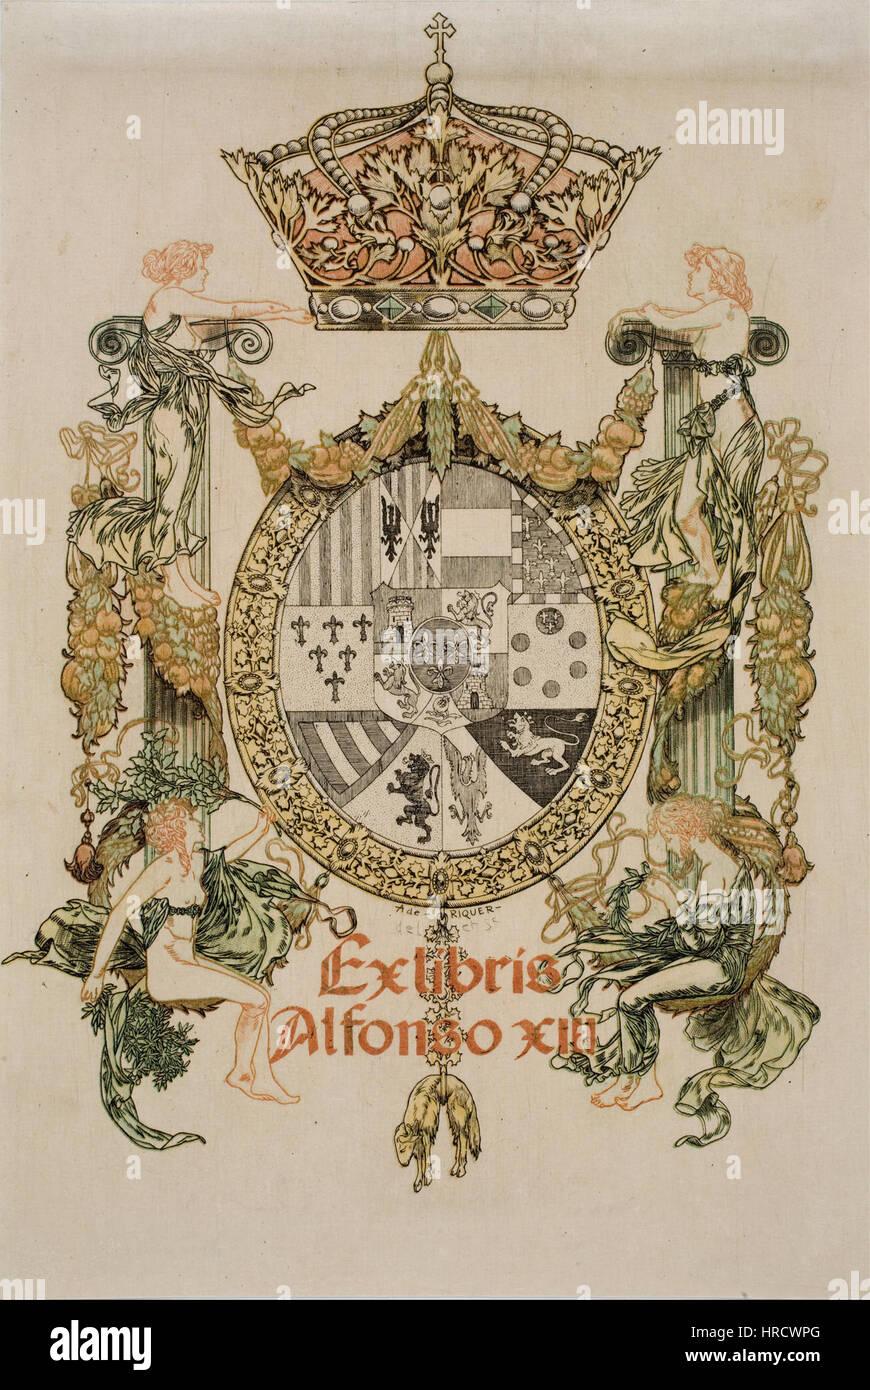 Alexandre de Riquer - Book-plate of Alfons XIII - Google Art Project - Stock Image